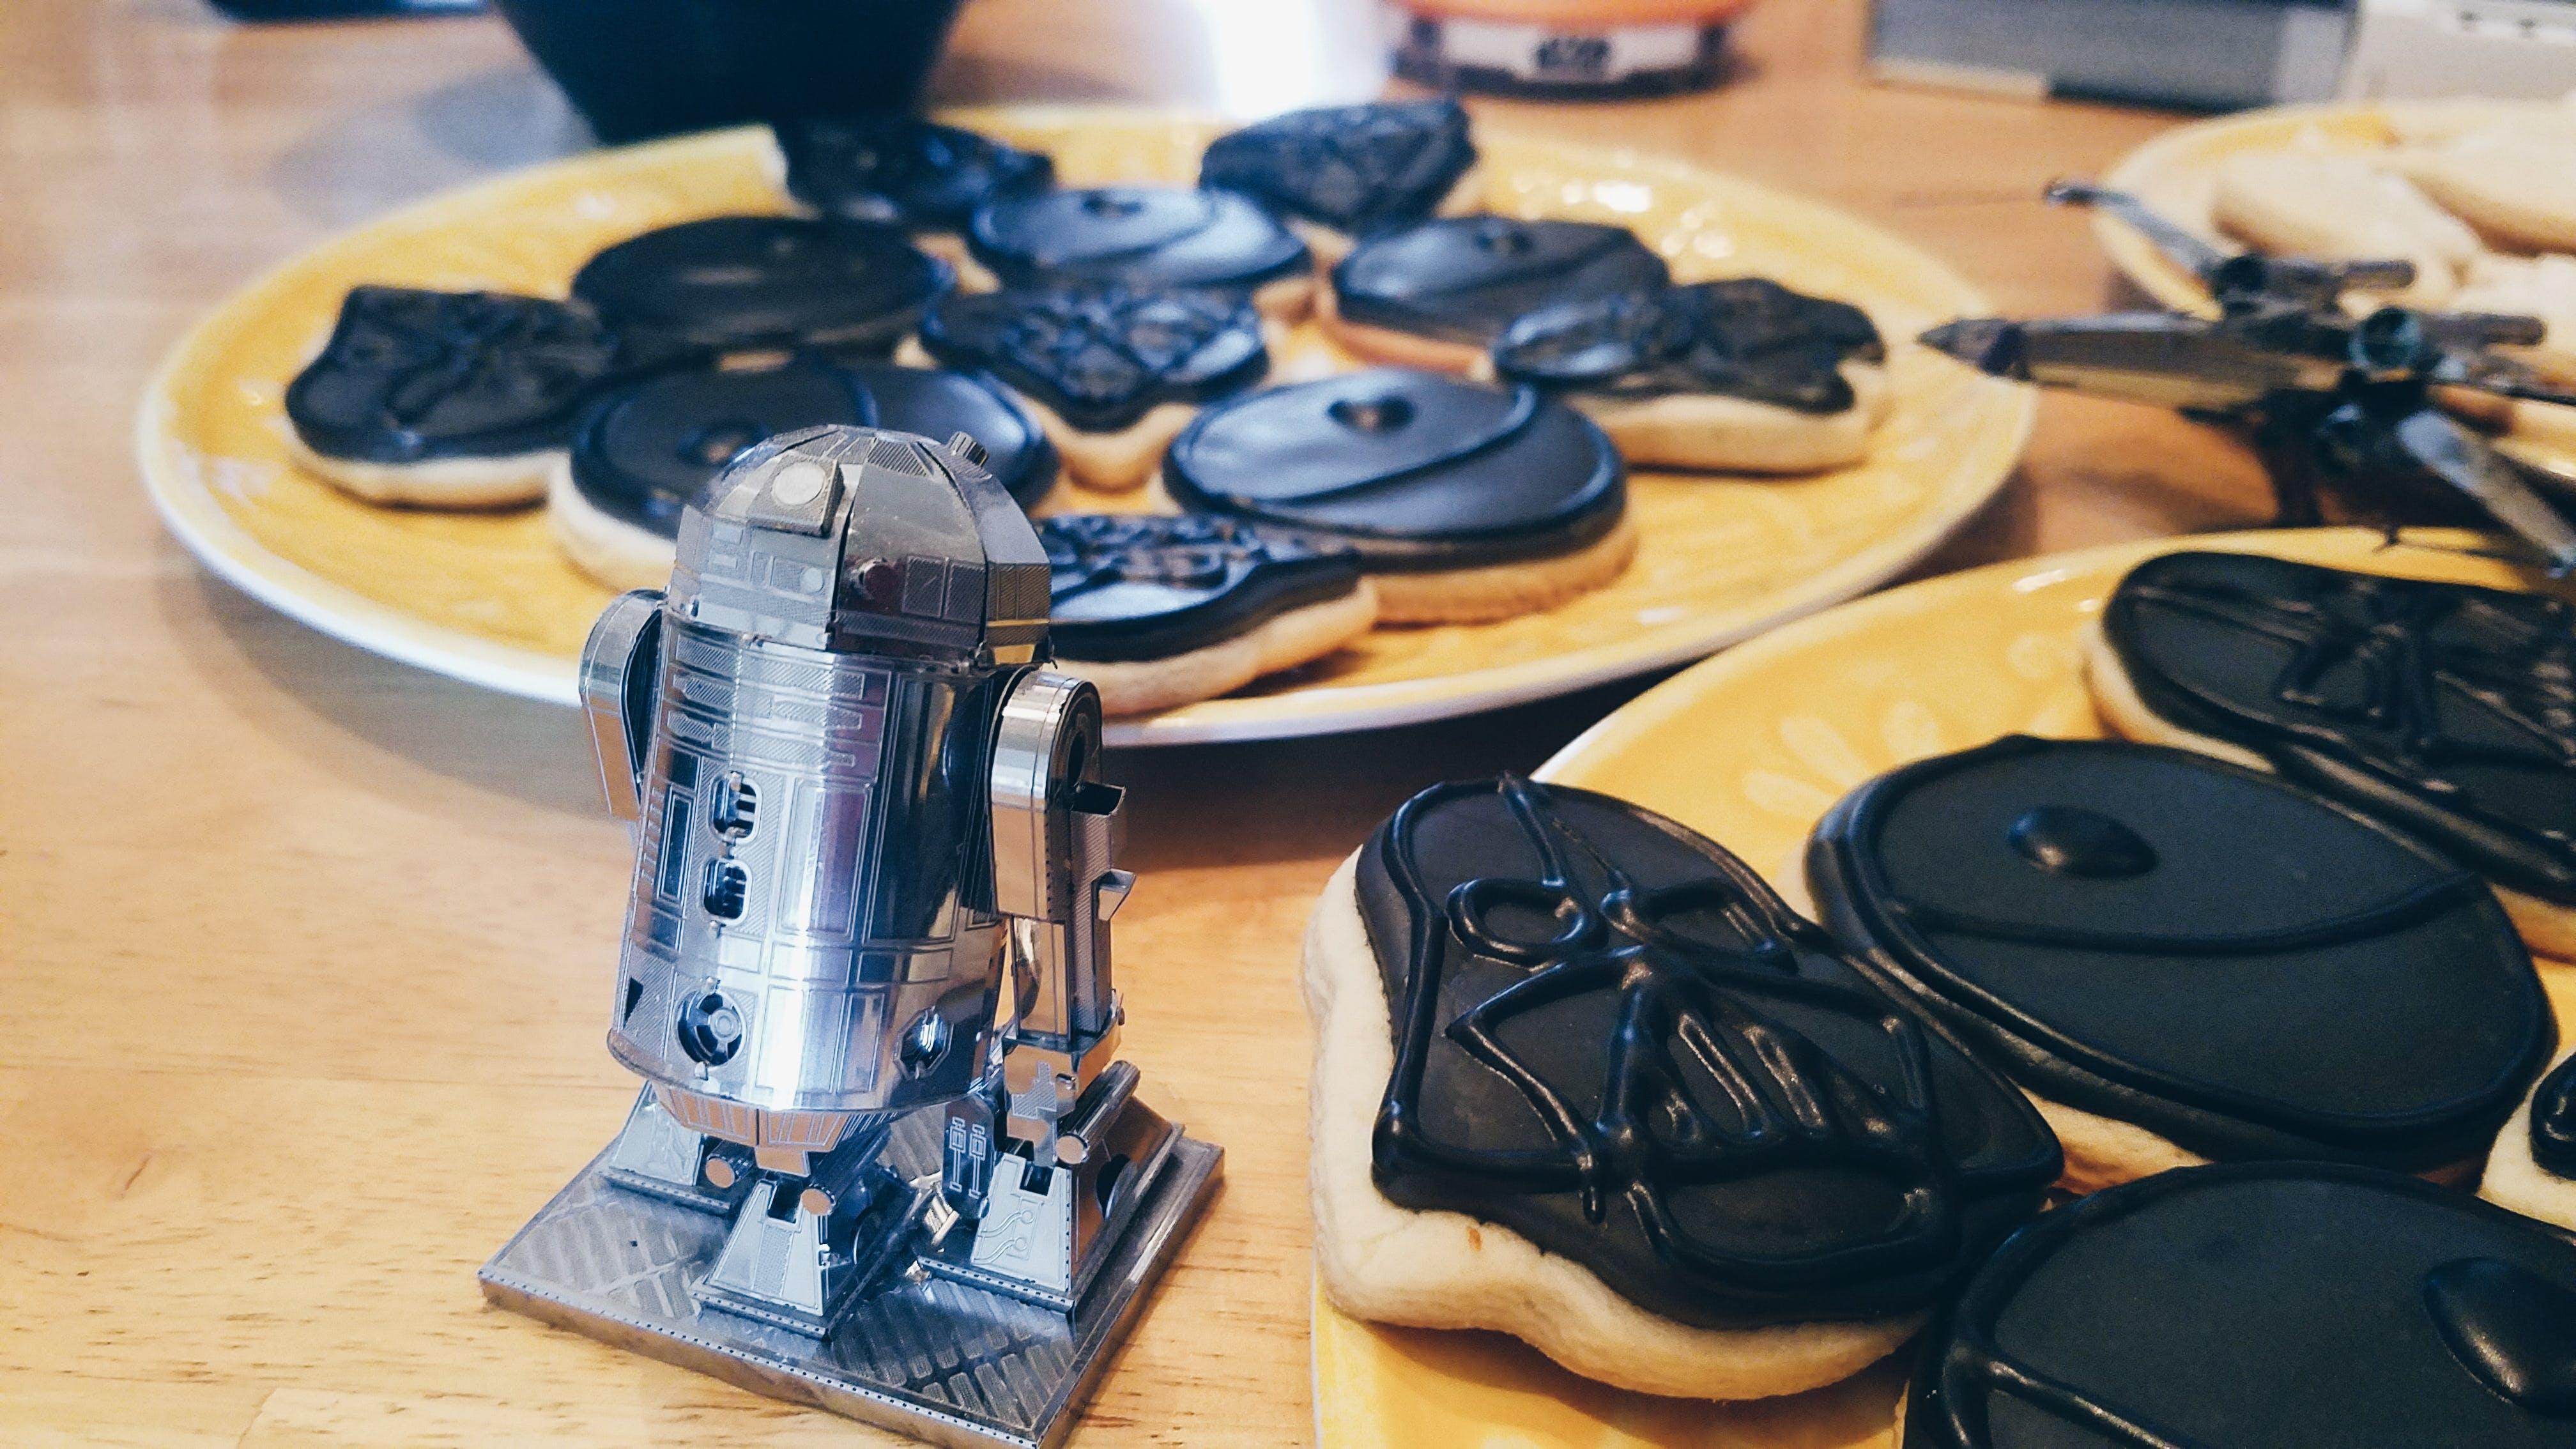 Metal model of R2-D2 in front of some star wars cookies